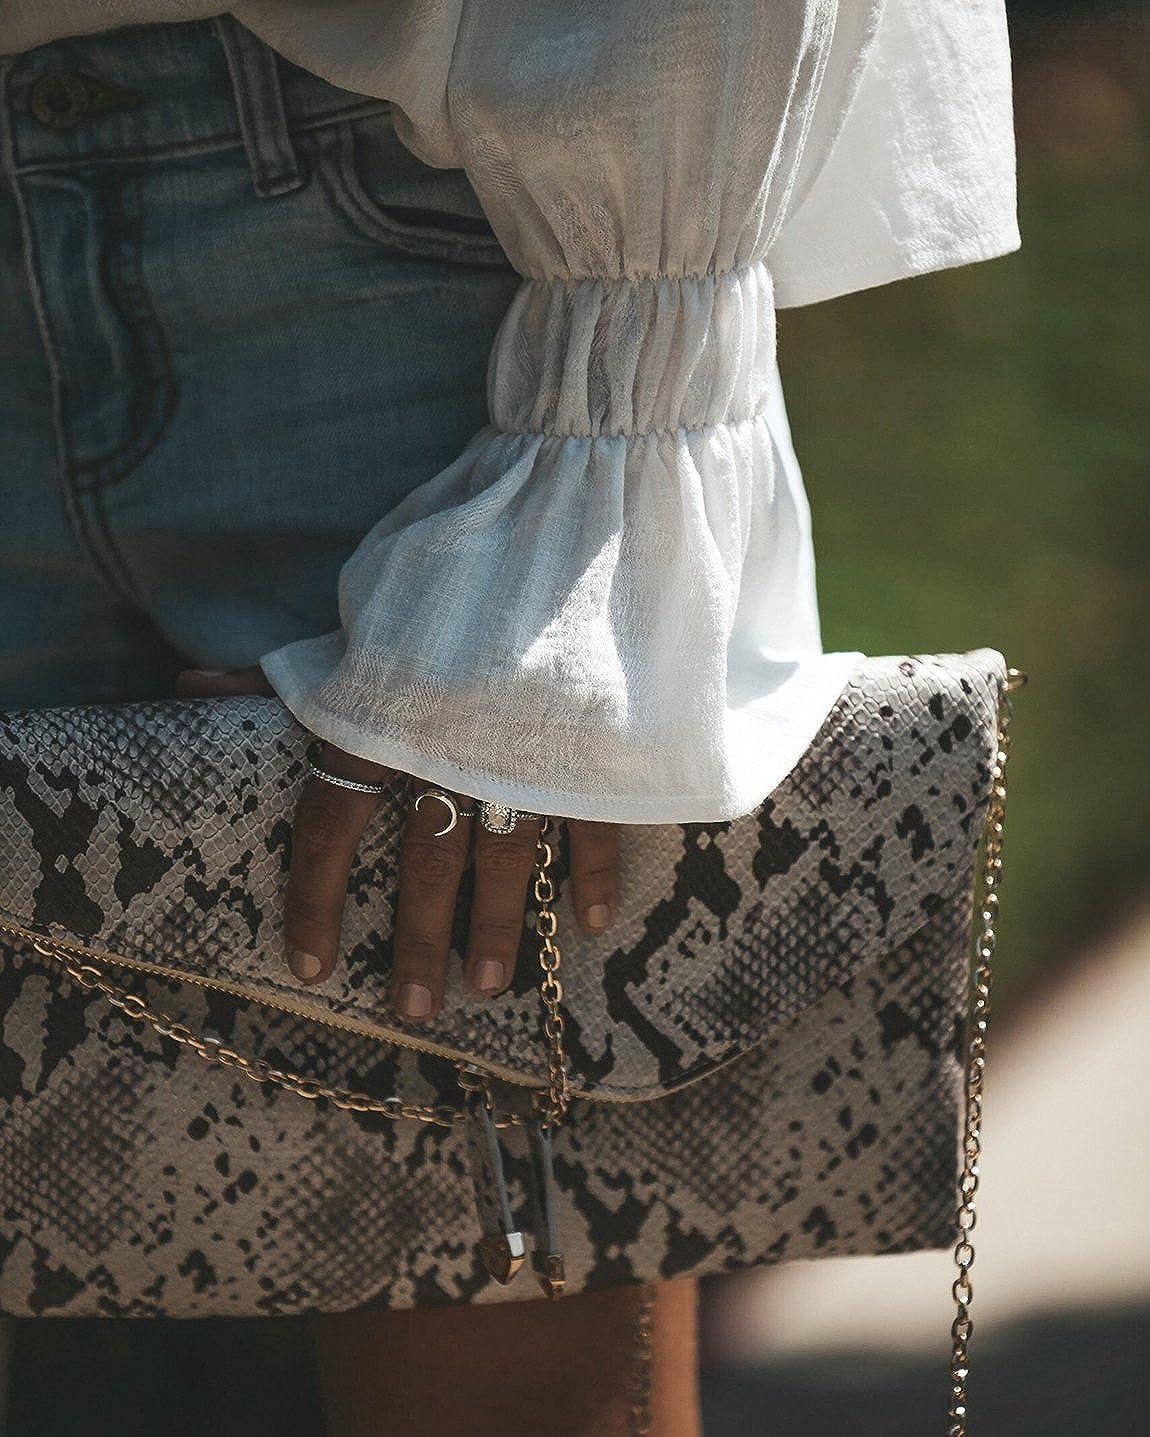 Mujeres Vintage Victorian Pull Over Trompeta Manga Suelta Top Cuello Alto con Volantes Volantes Blusa Camisa